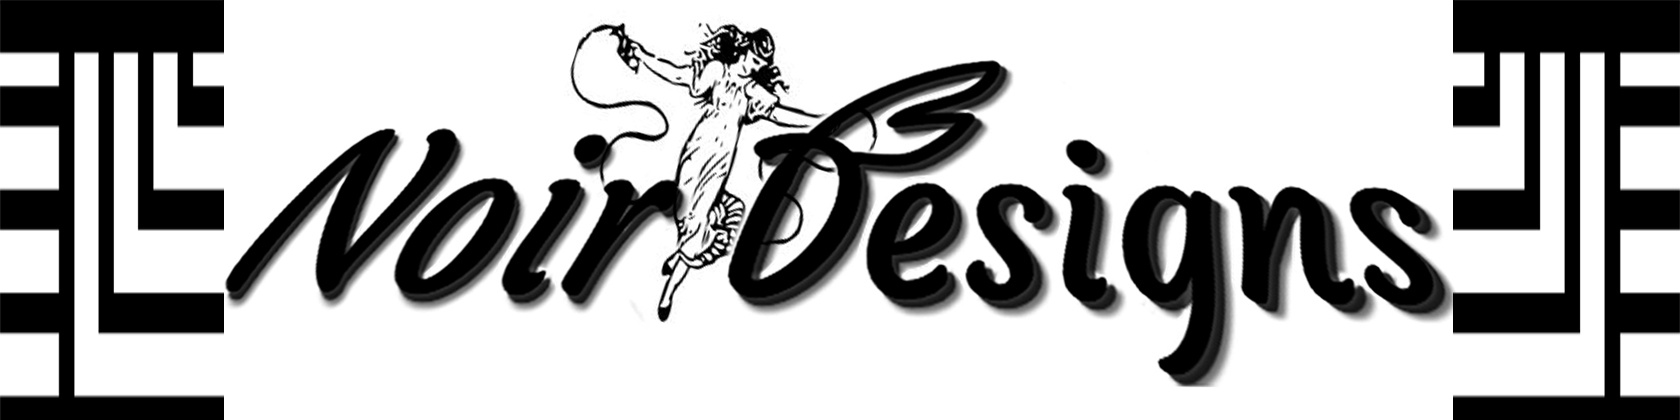 noirdesigns Cover